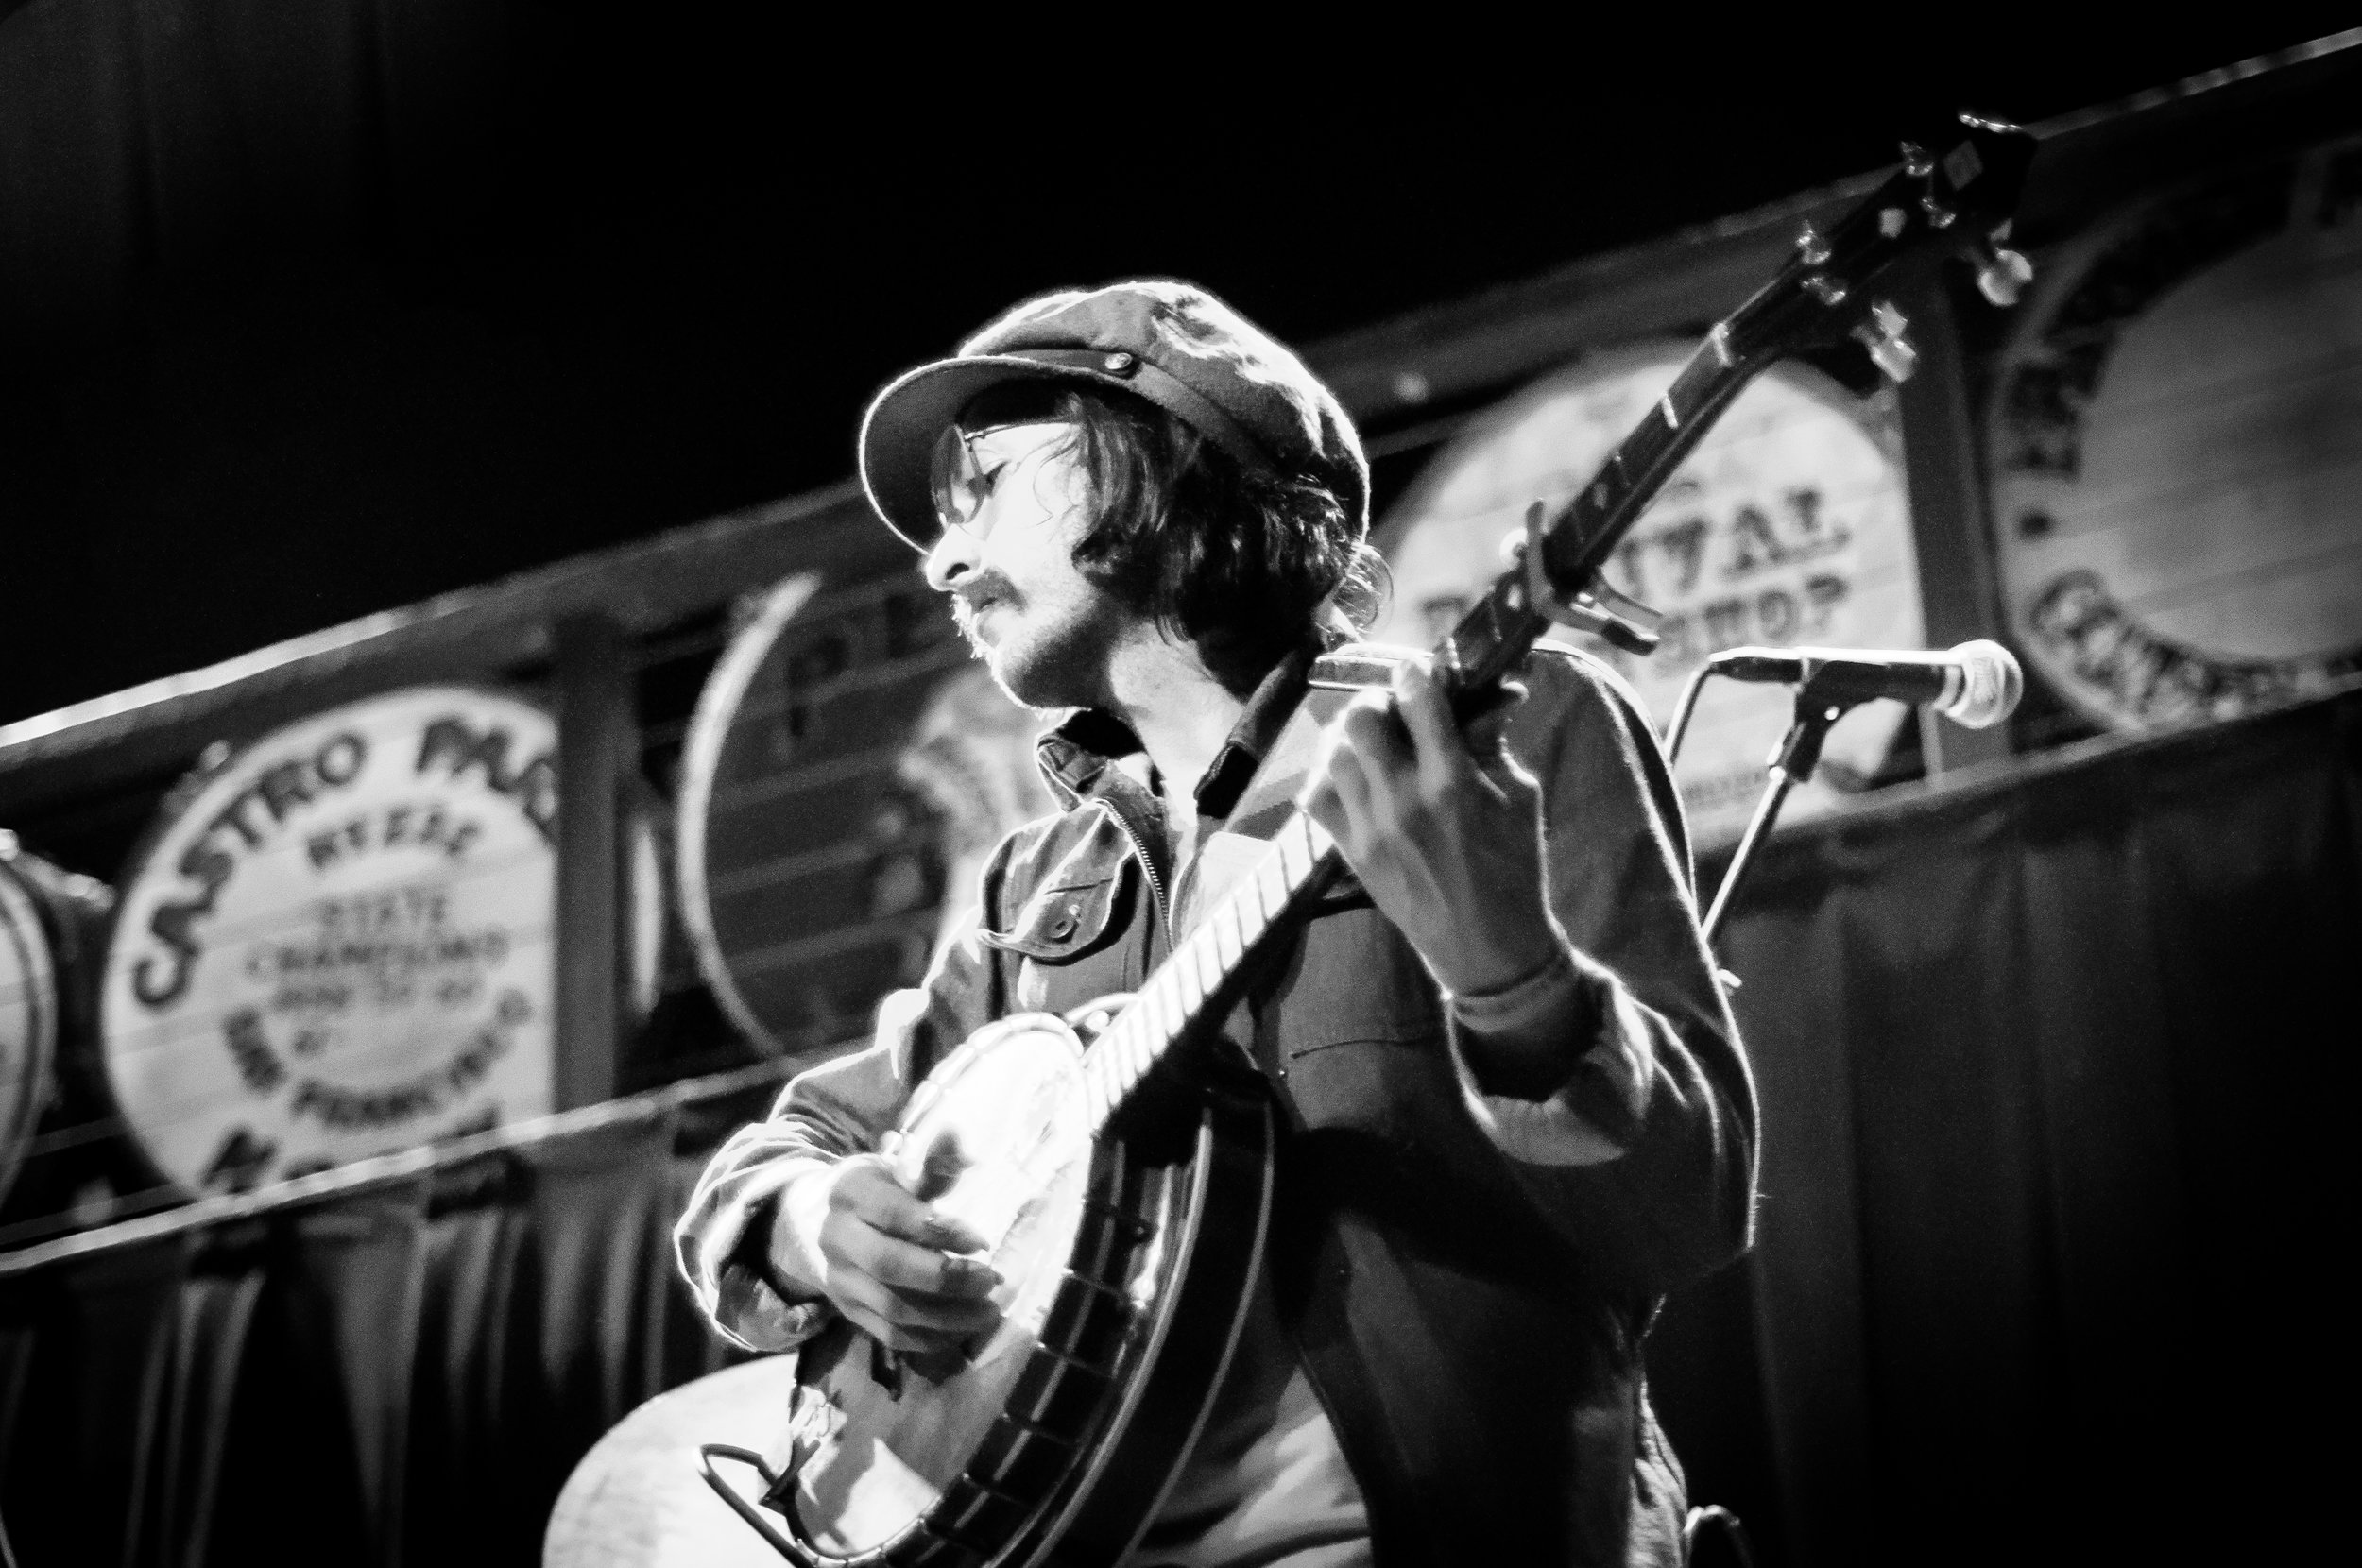 Stephen Pierce of Banditos, Mississippi Studios, Portland, Oregon, 2016